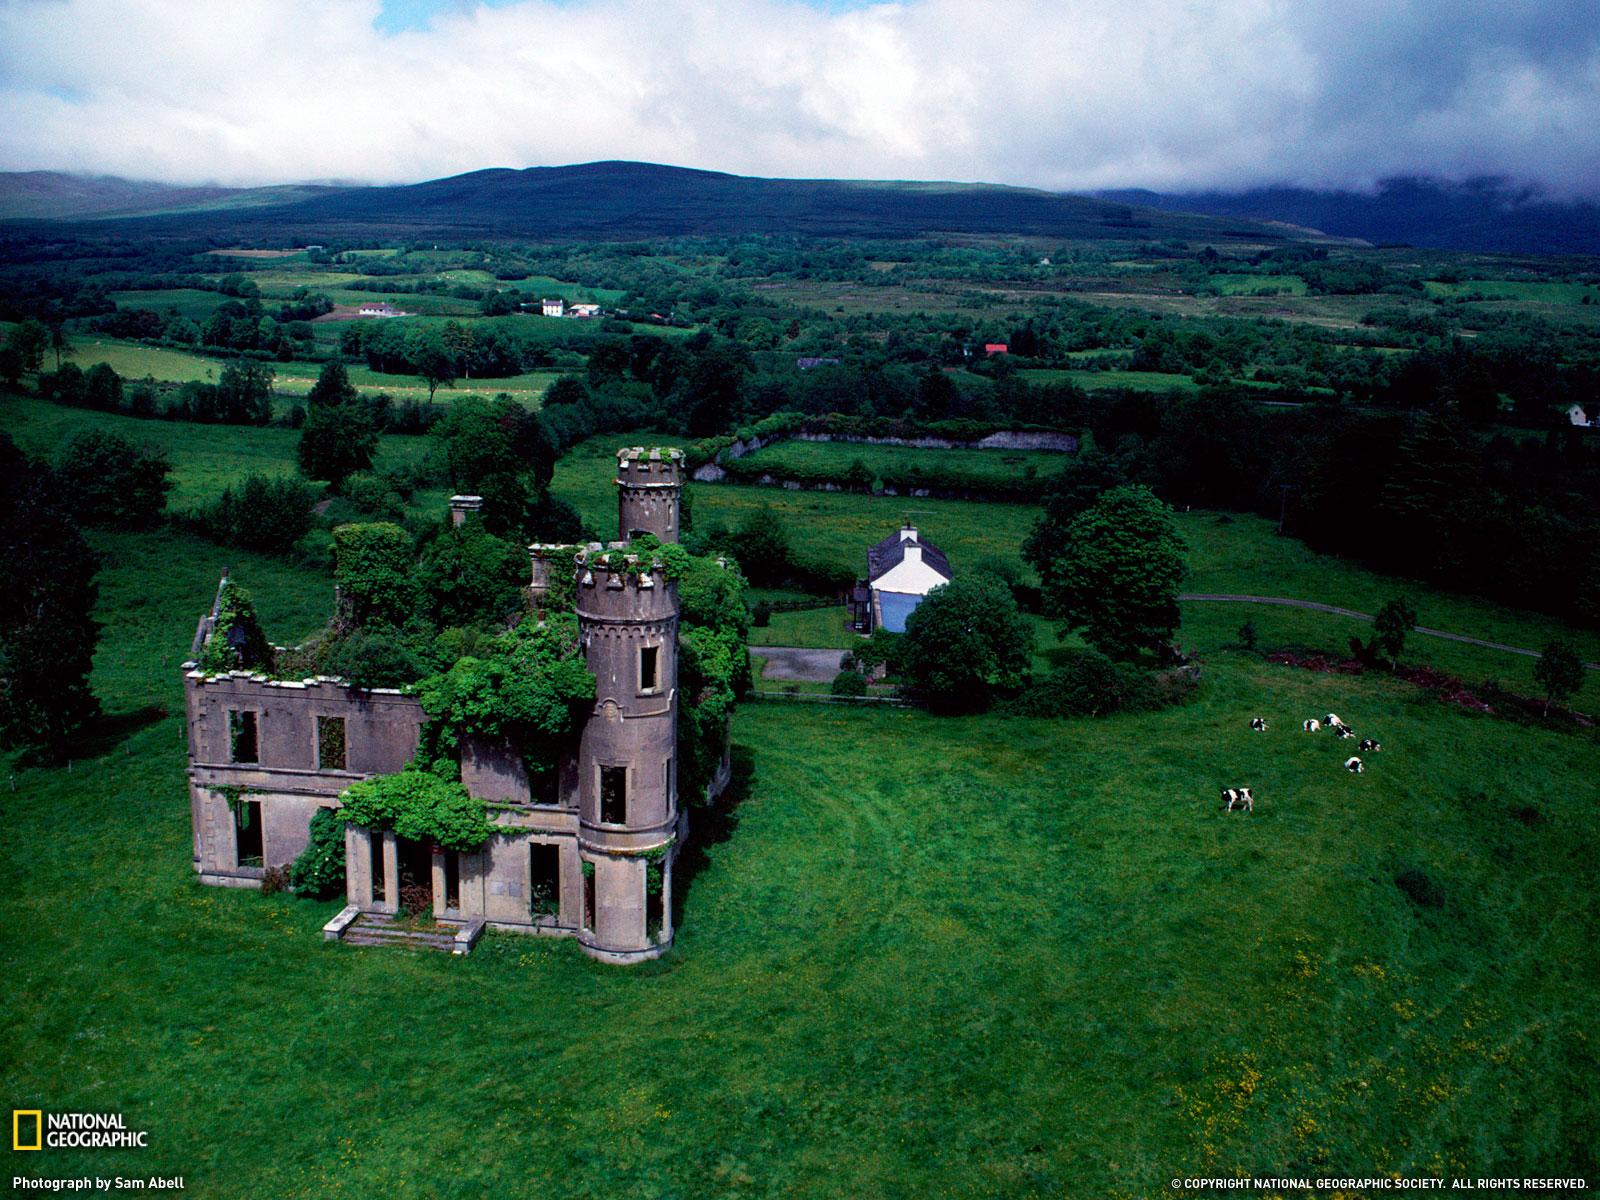 http://3.bp.blogspot.com/-PlLIO4N2ygI/UWvTeY2kEpI/AAAAAAAABkM/eWhMtHtlnJY/s1600/3533_1600x1200-wallpaper-Castle-Near-Kilgarvan-Ireland.jpg